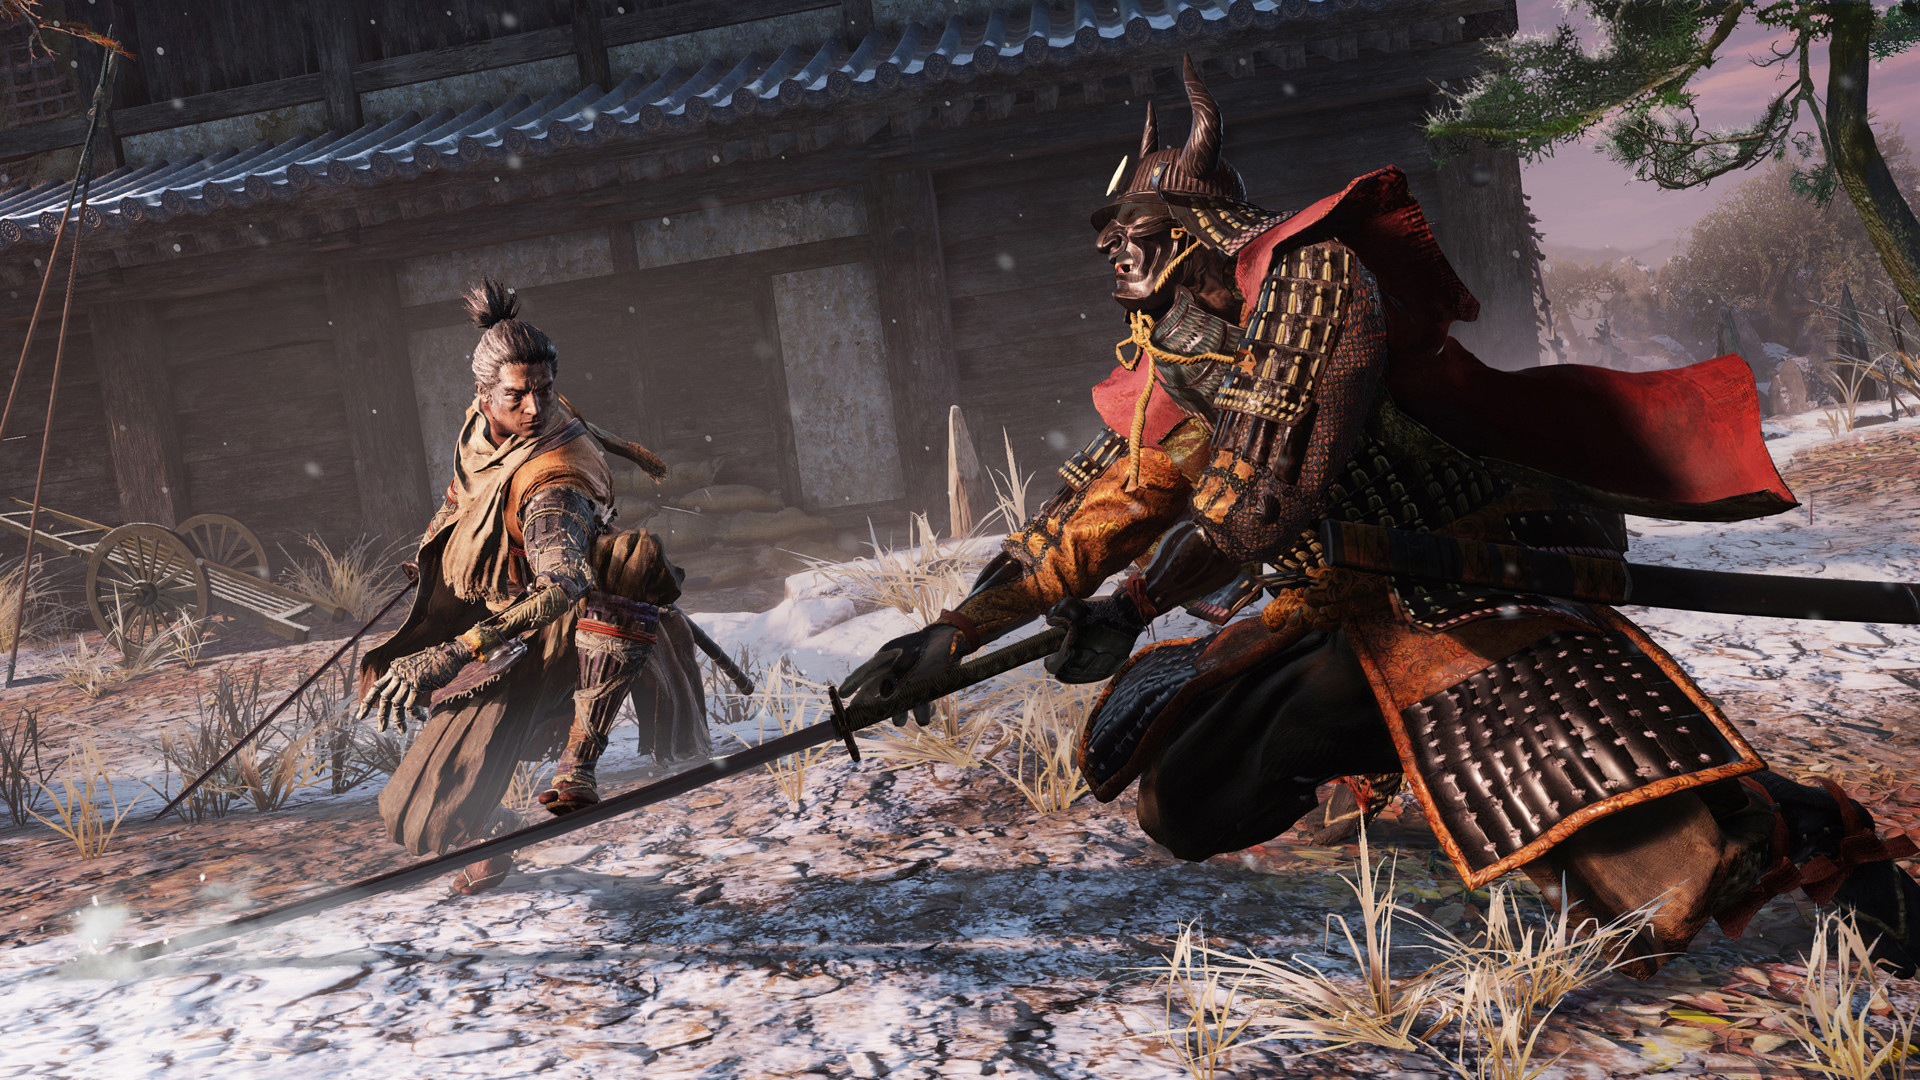 After Bloodborne and Dark Souls III, I'm skipping Sekiro's launch trailer screenshot